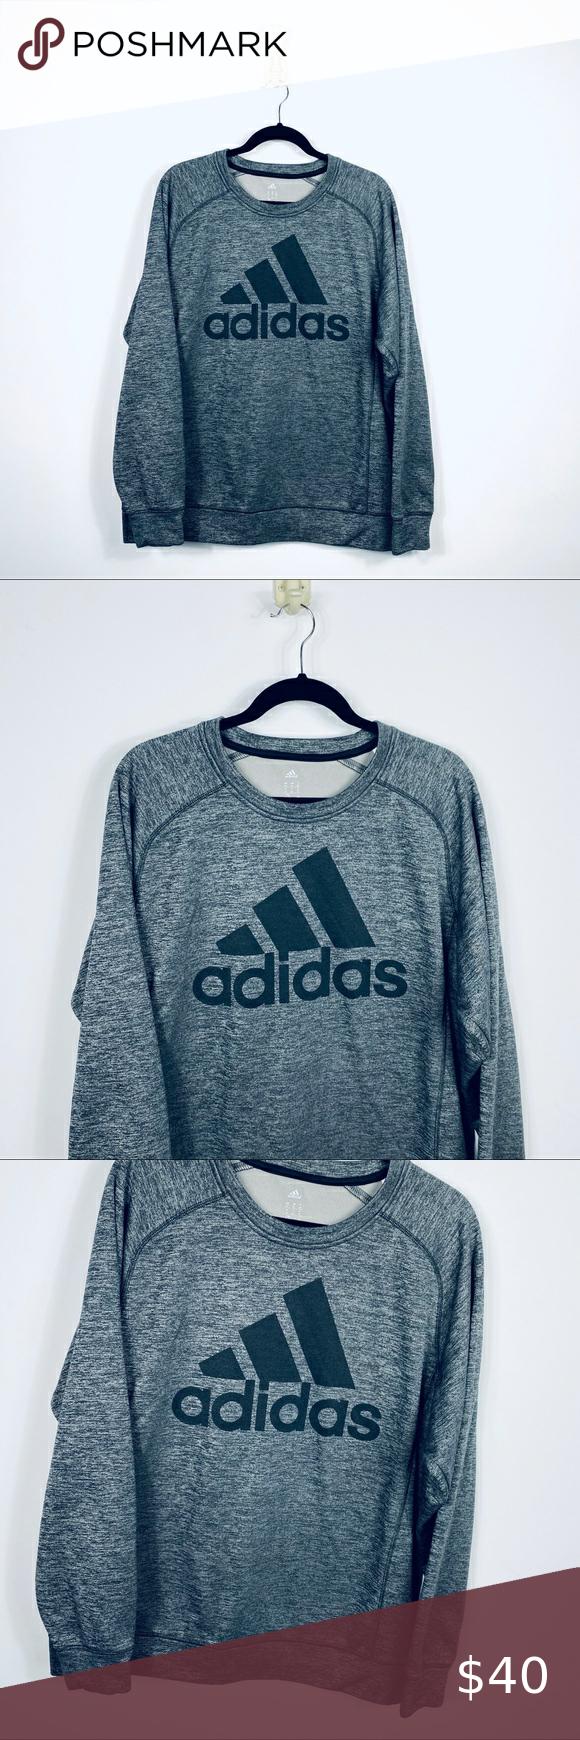 Adidas Xl Team Issue Fleece Crew Neck Sweatshirt Men S Adidas Xl Team Issue Fleece Crew Neck Sweatshirt Gray Crew Neck Sweatshirt Sweatshirts Sweatshirt Shirt [ 1740 x 580 Pixel ]